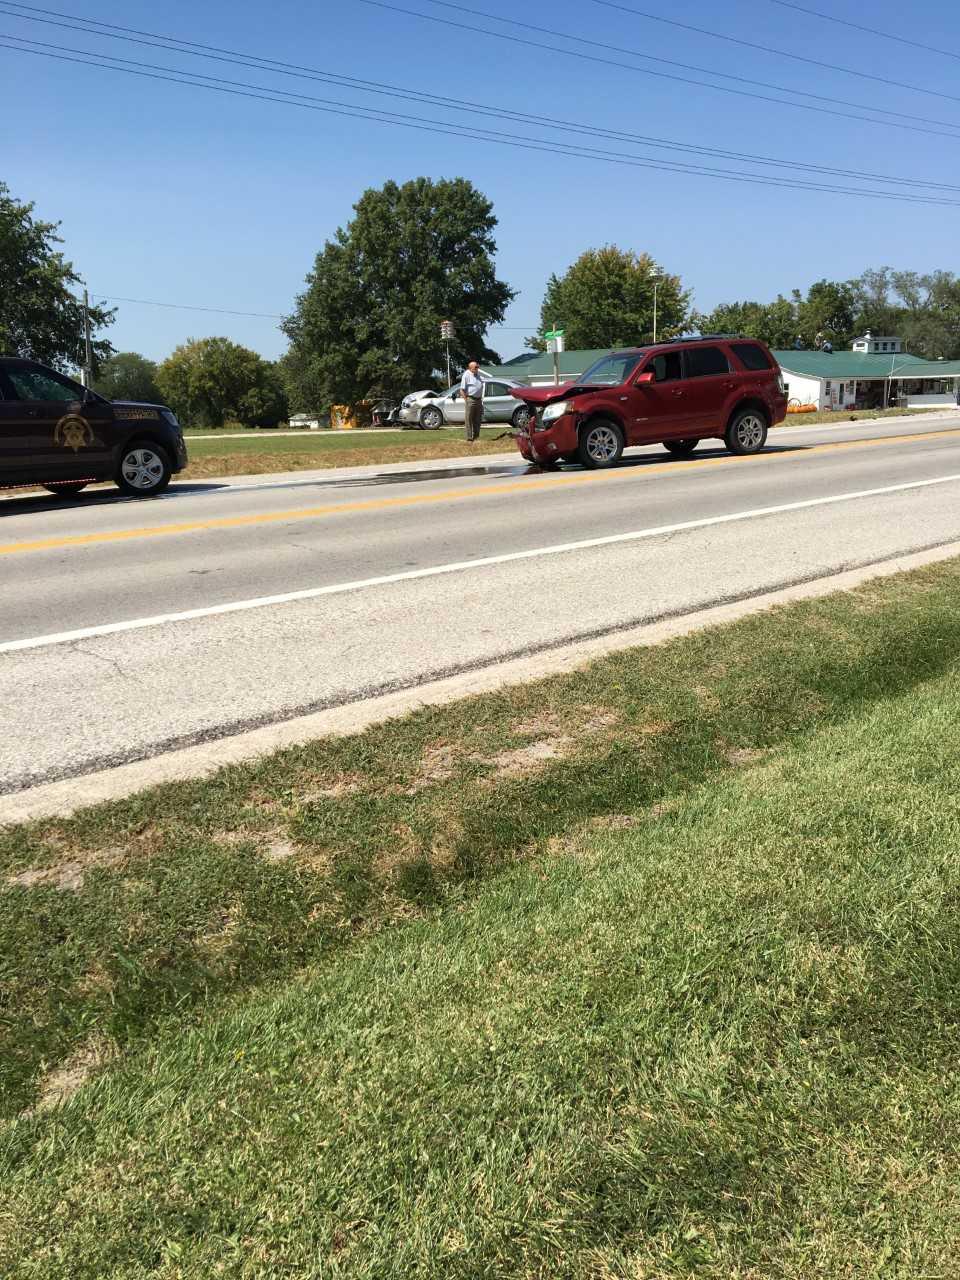 UPDATE – Head-on collision north of Carrollton on US-65 kills local resident